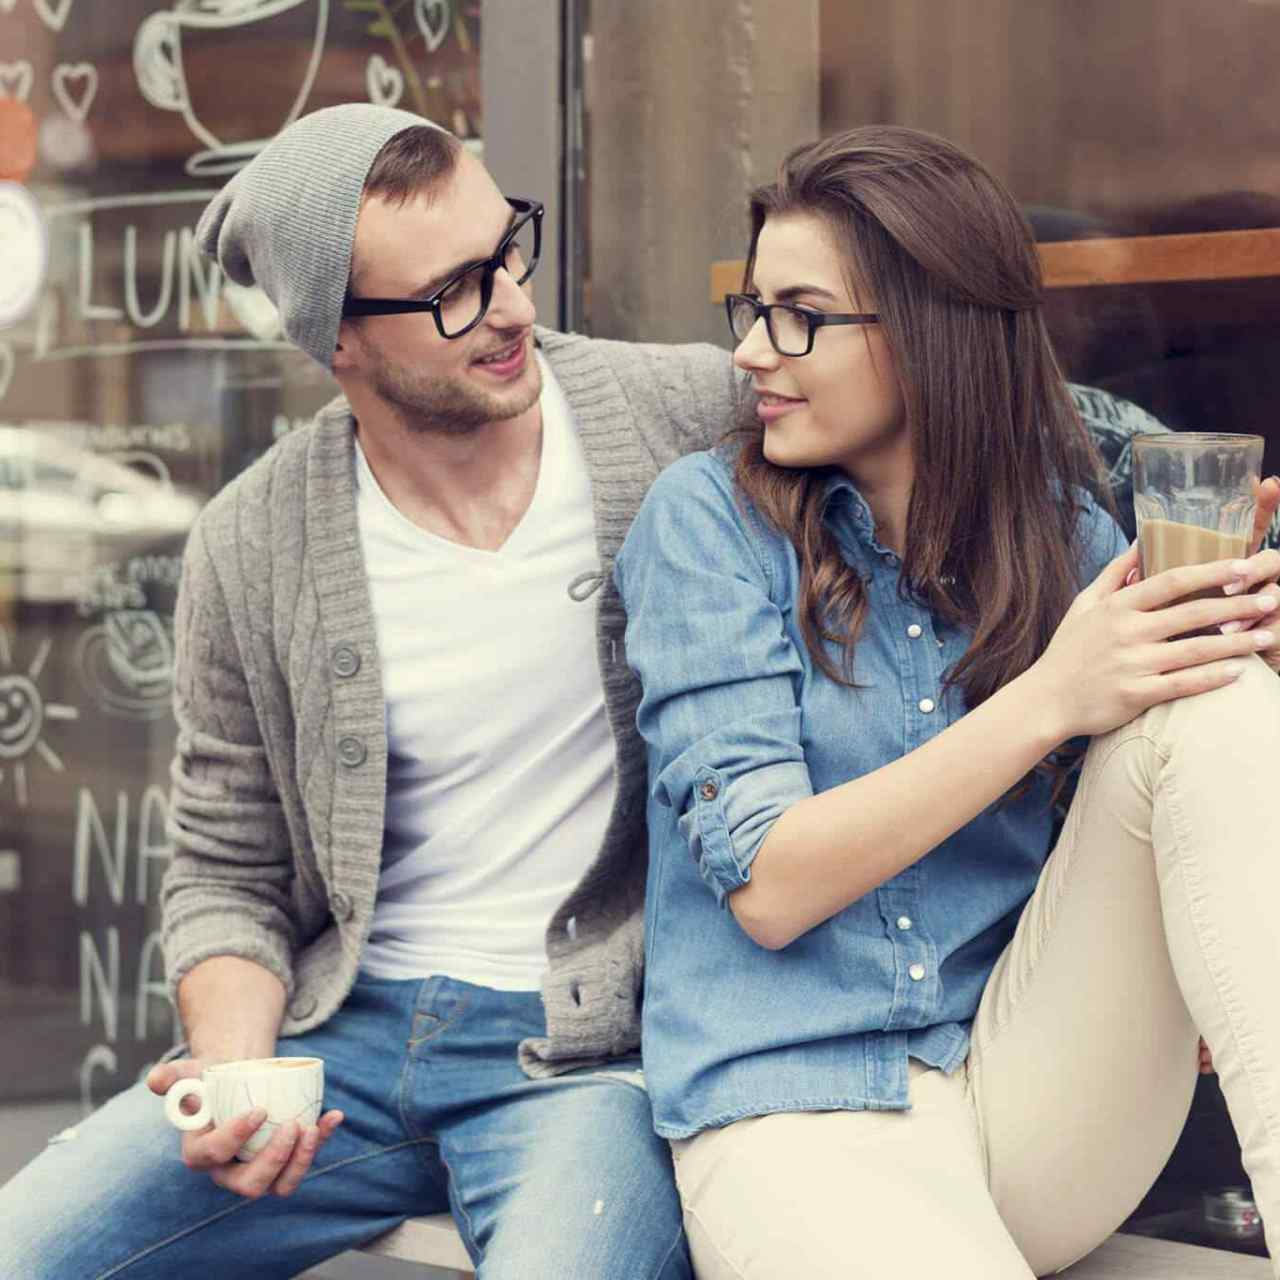 https://i0.wp.com/truhap.com/wp-content/uploads/2018/01/img-class-marriage-02.jpg?resize=1280%2C1280&ssl=1